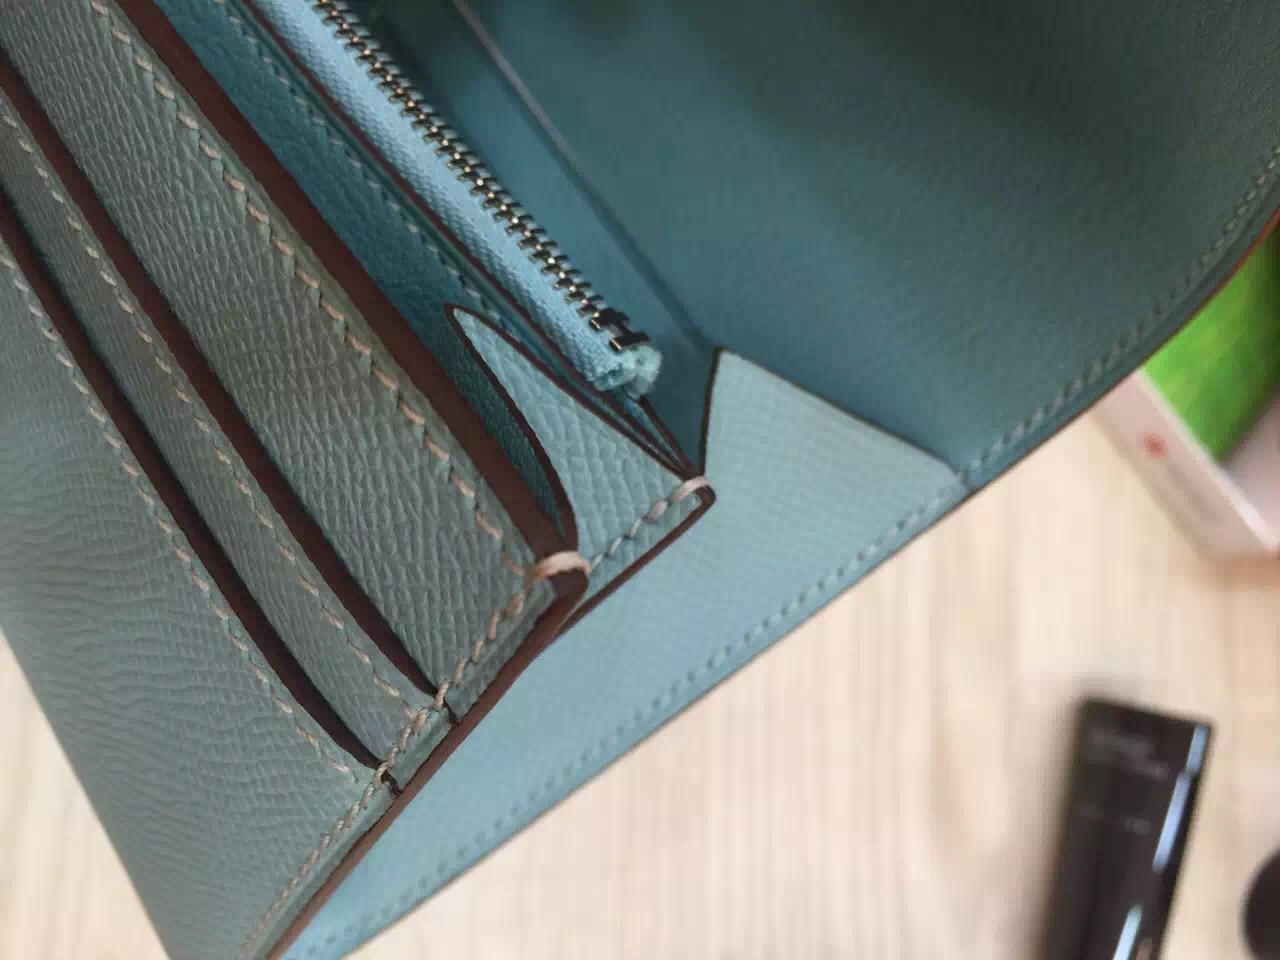 Wholesale Hermes Light Blue Epsom Leather Constance Wallet Purse Clutch Bag